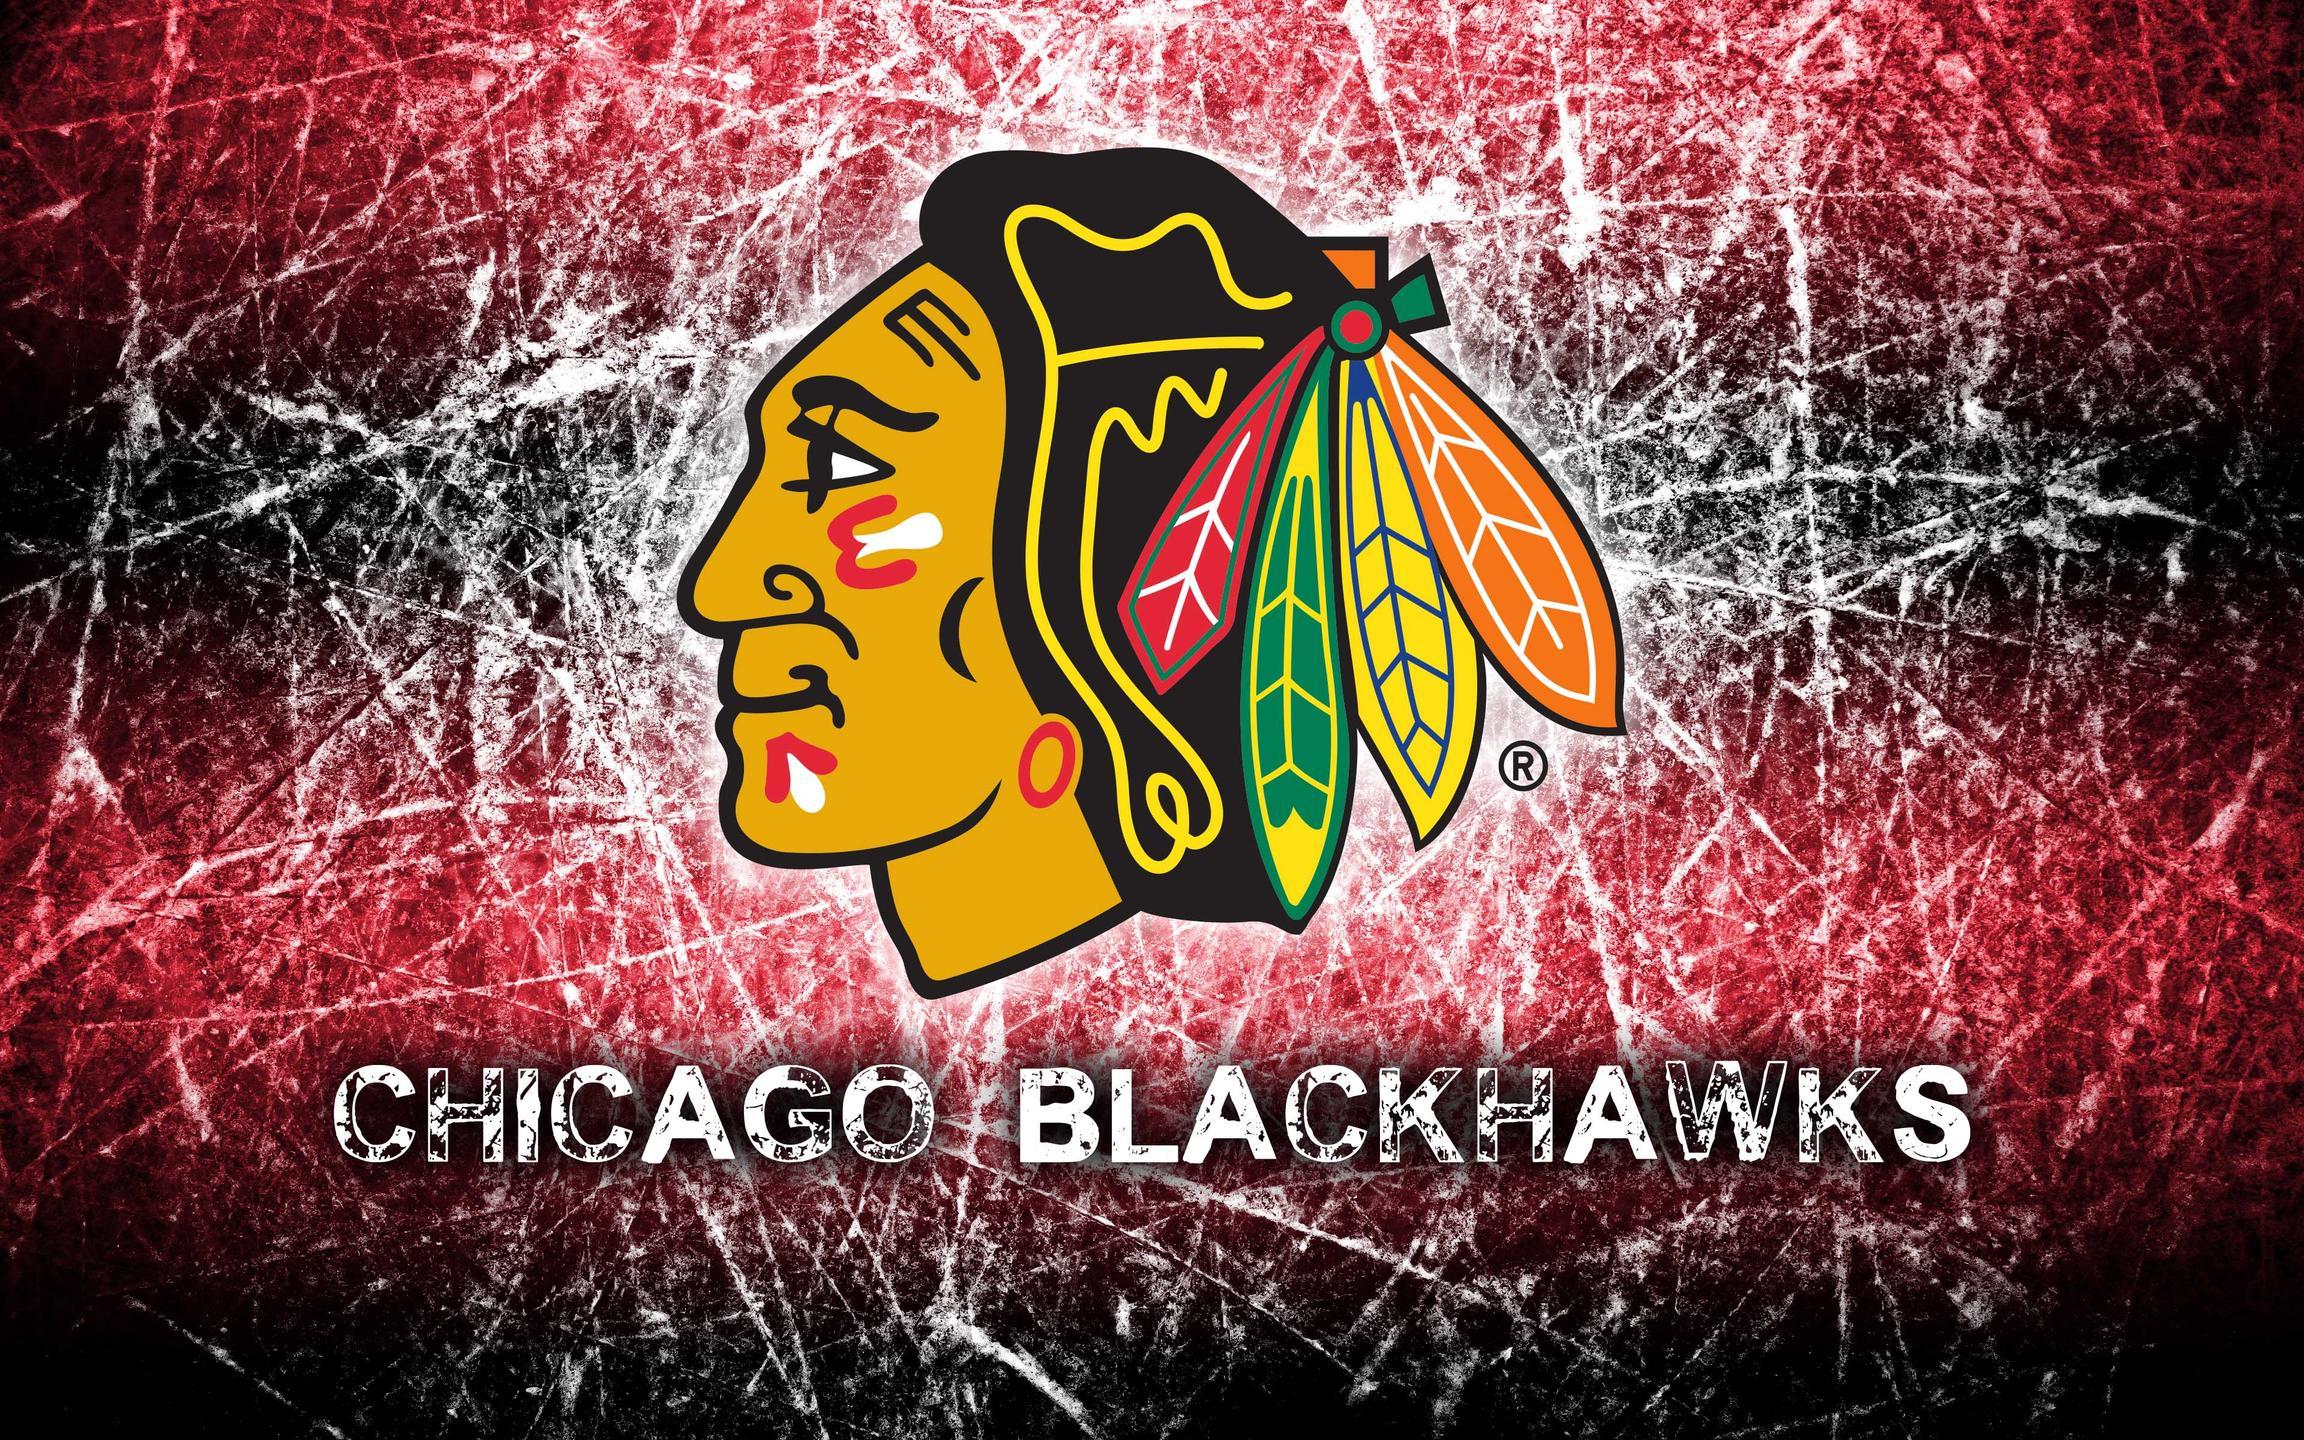 Chicago Blackhawks Desktop Backgrounds 2304x1440